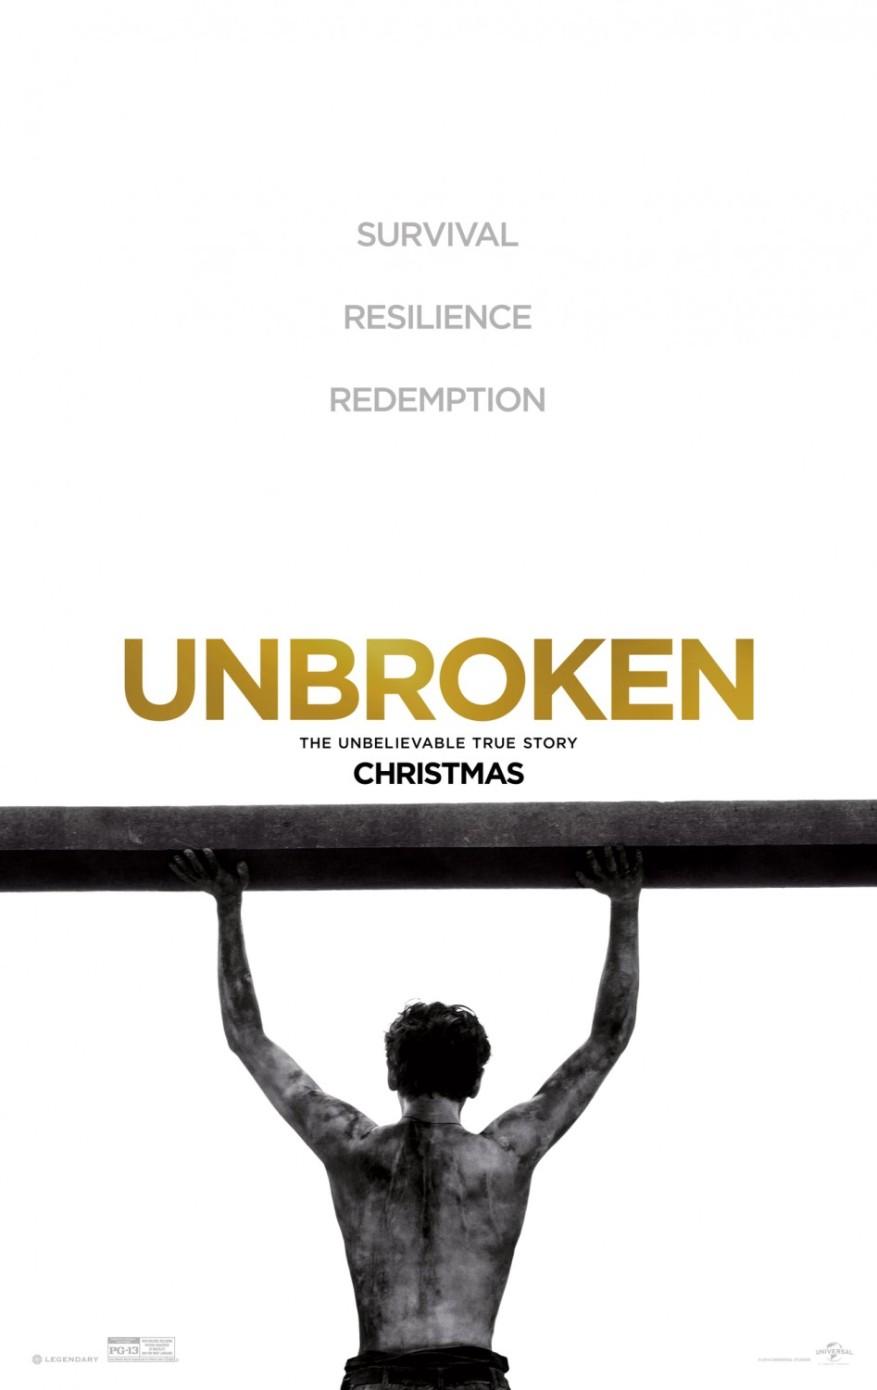 unbroken poster 02